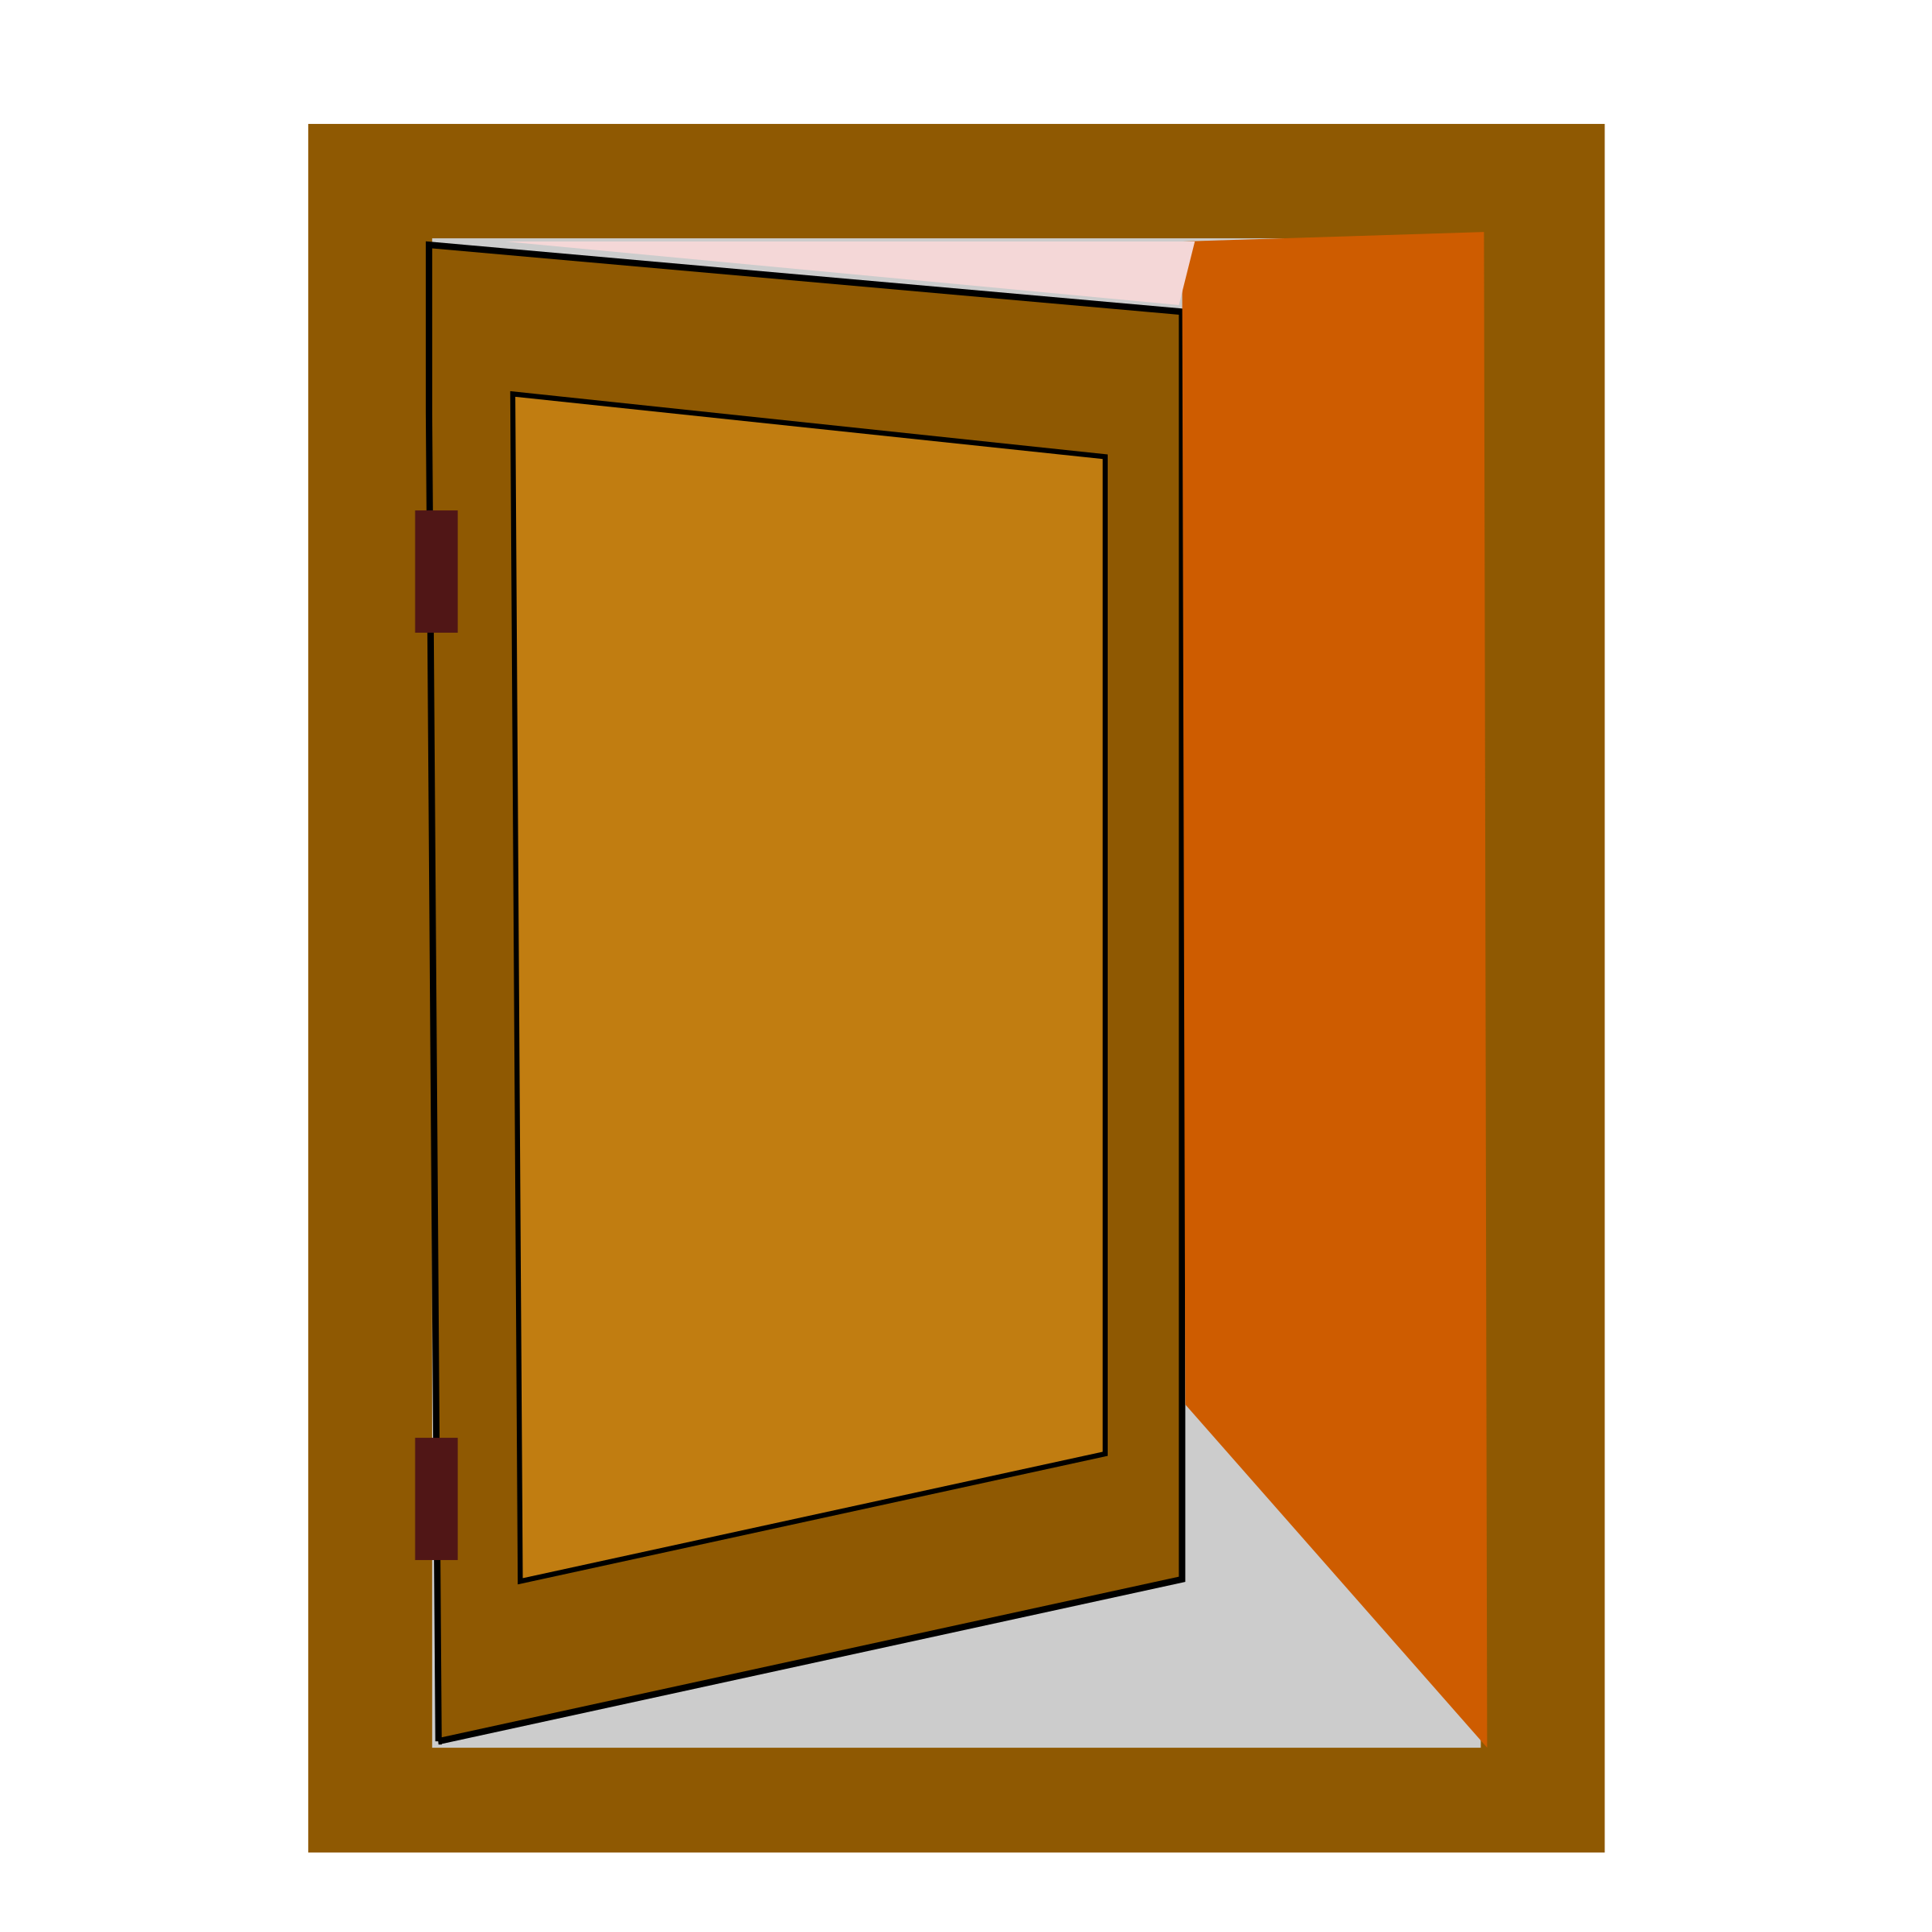 royalty free stock Clipart netalloy big image. Vector door animated